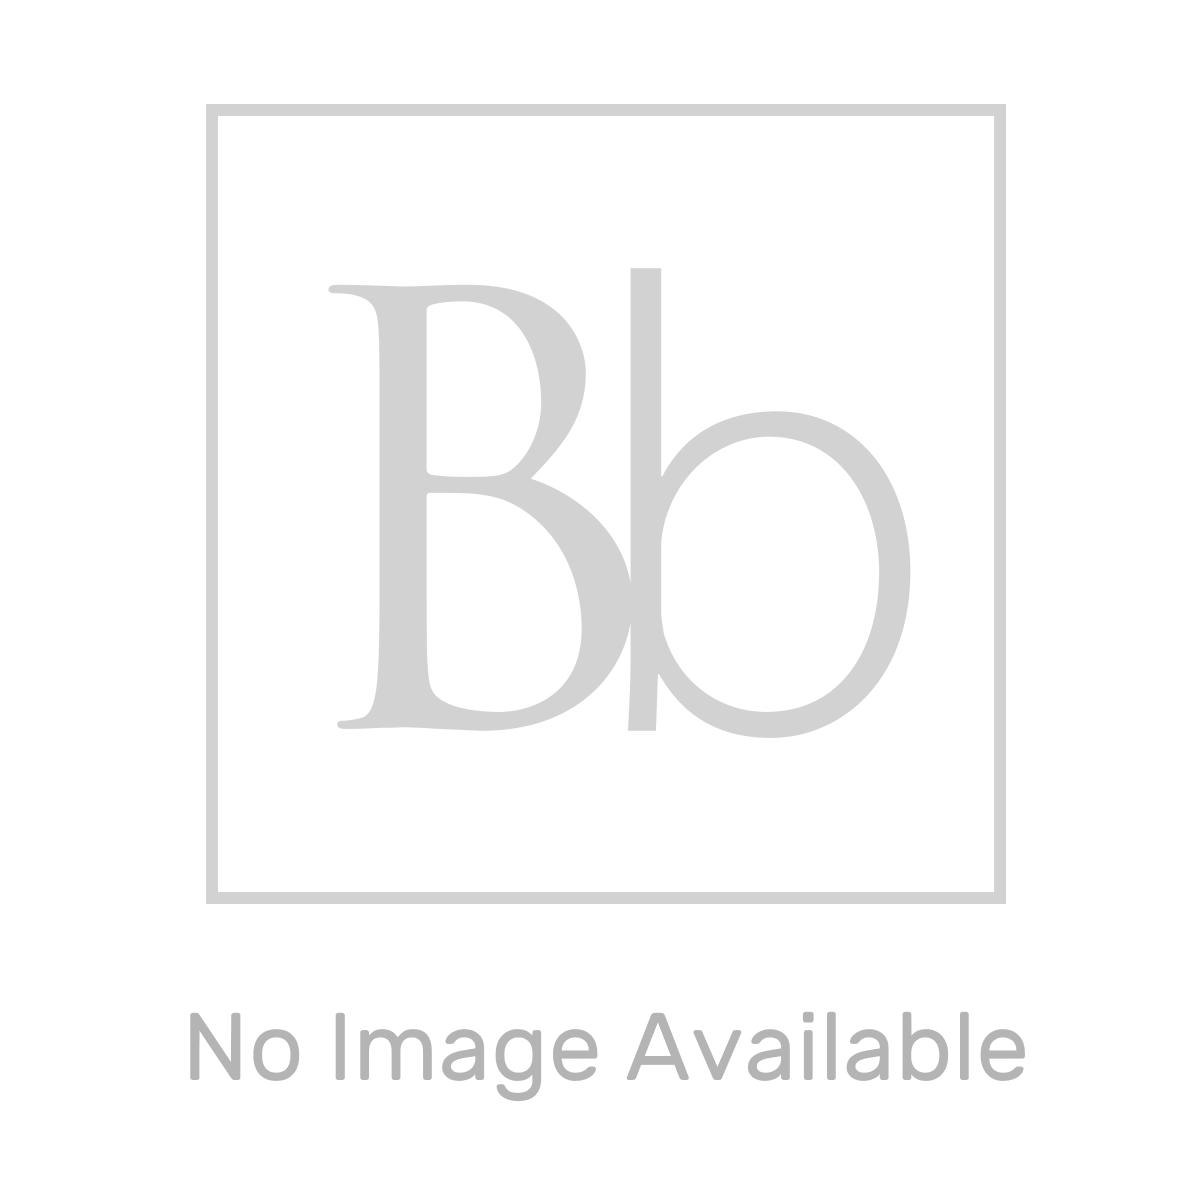 RAK Feeling Grey Rectangular Shower Tray 1200 x 800mm Measurements